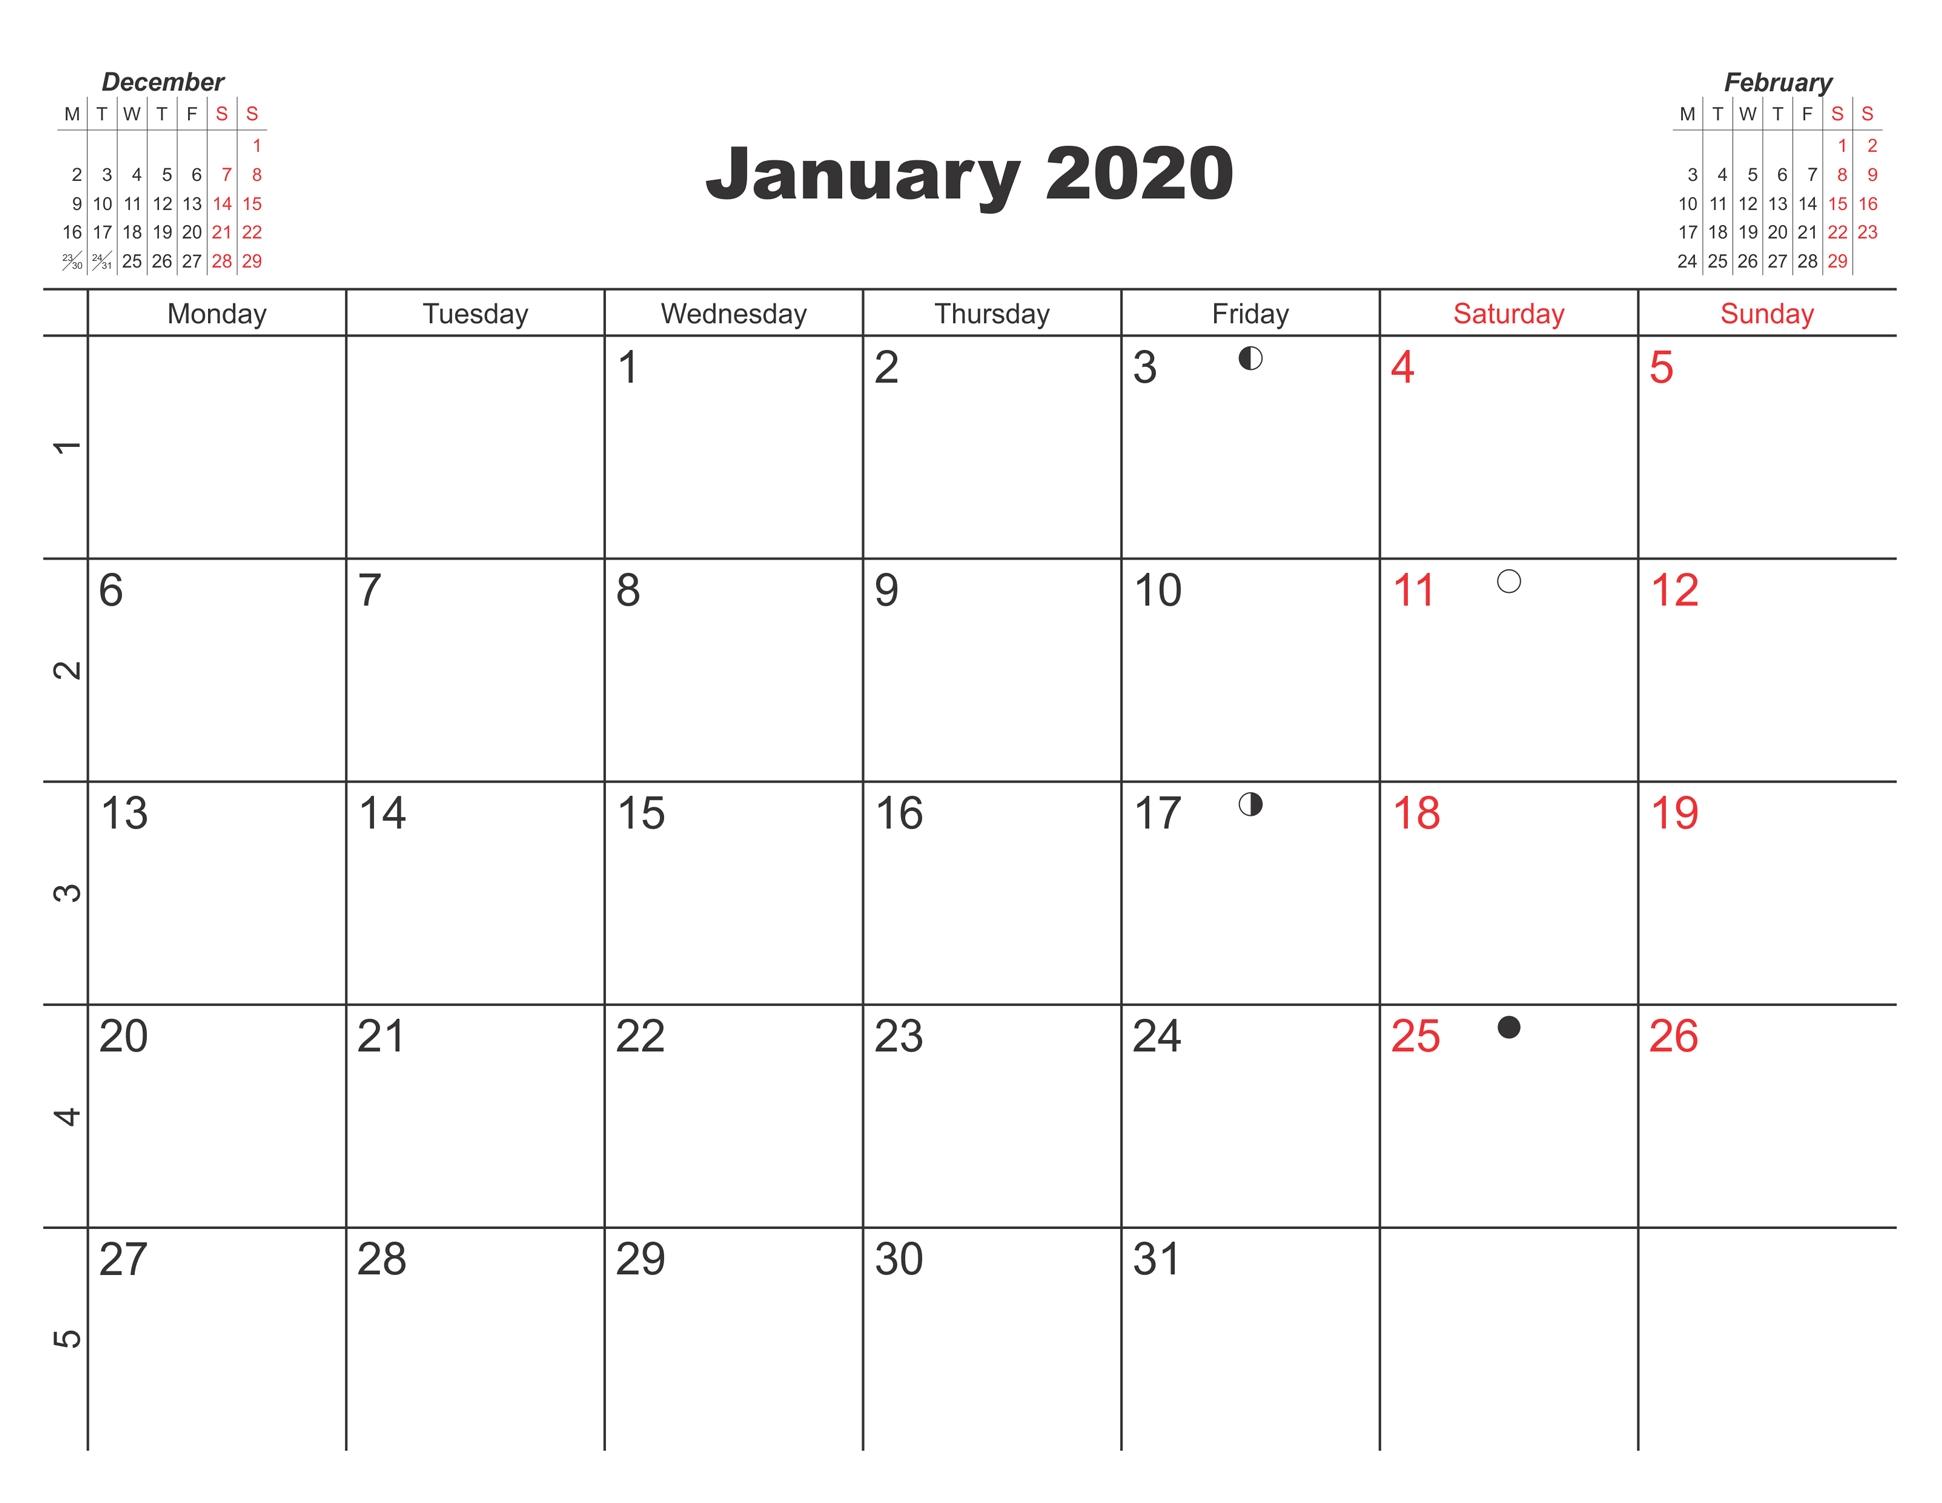 Online January 2020 Calendar Uk Holidays - 2019 Calendars-2020 Uk Monthly Calendar Uk